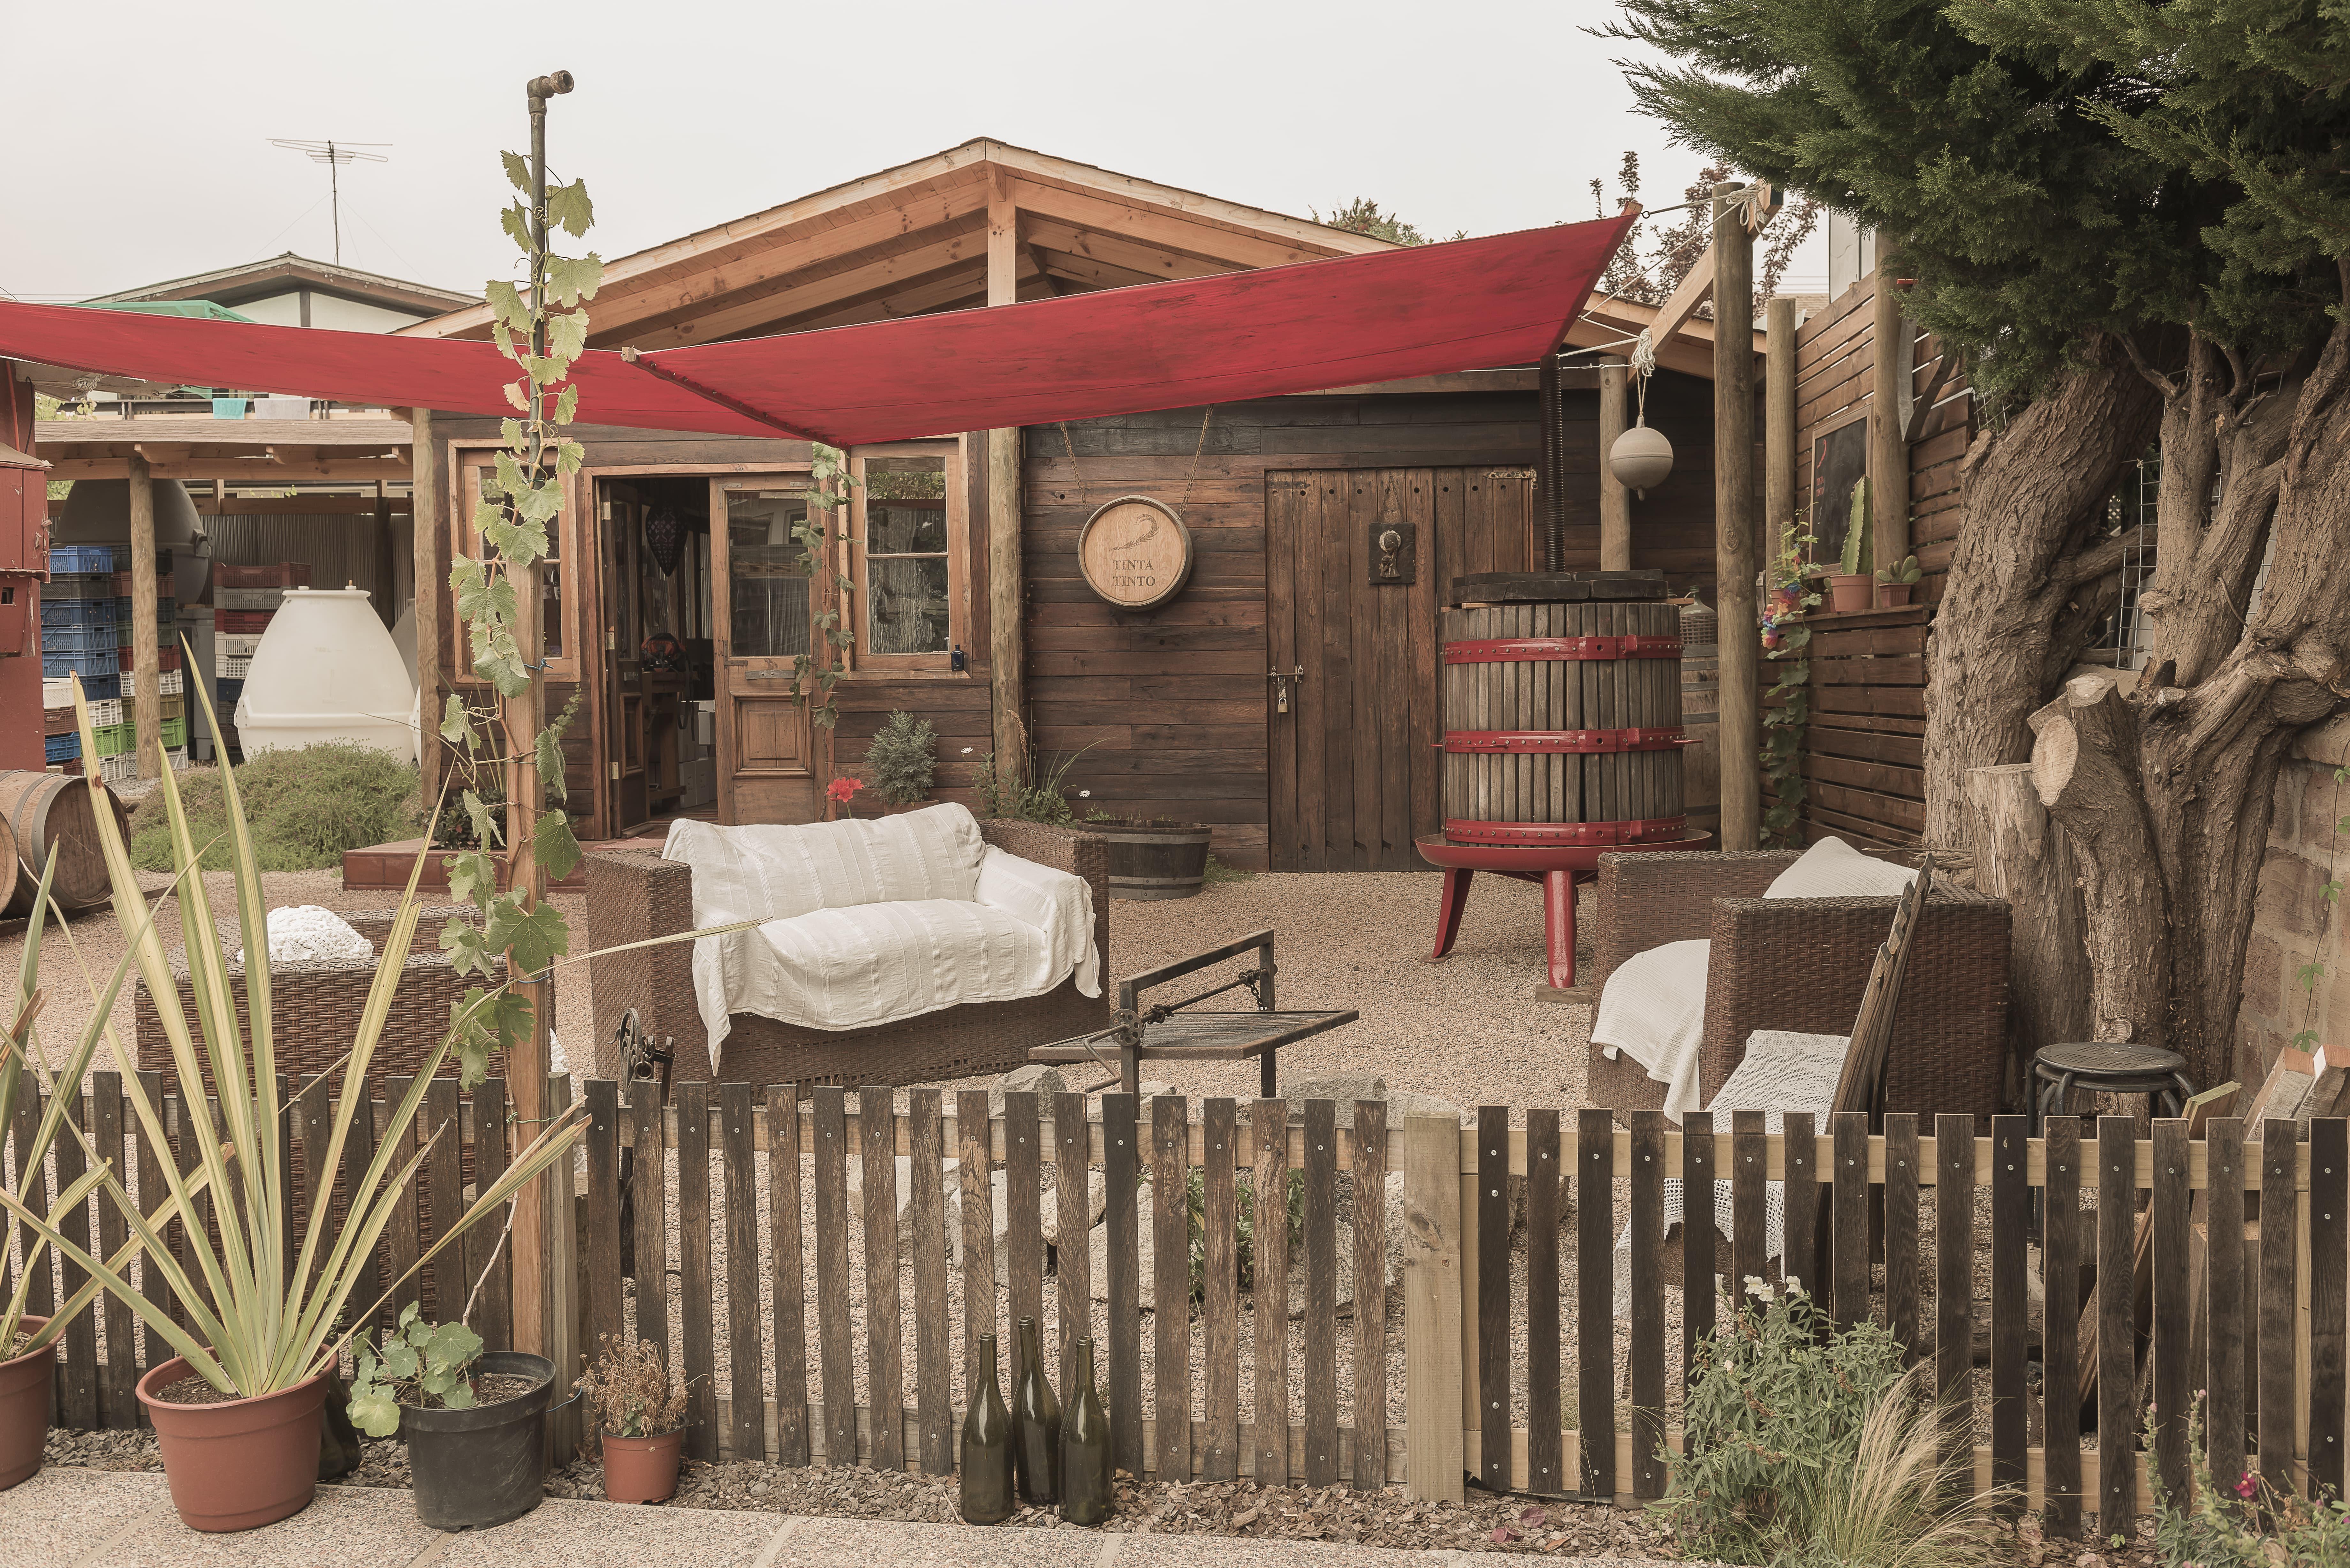 Tinta Tinto vores chilenske garage vinhus